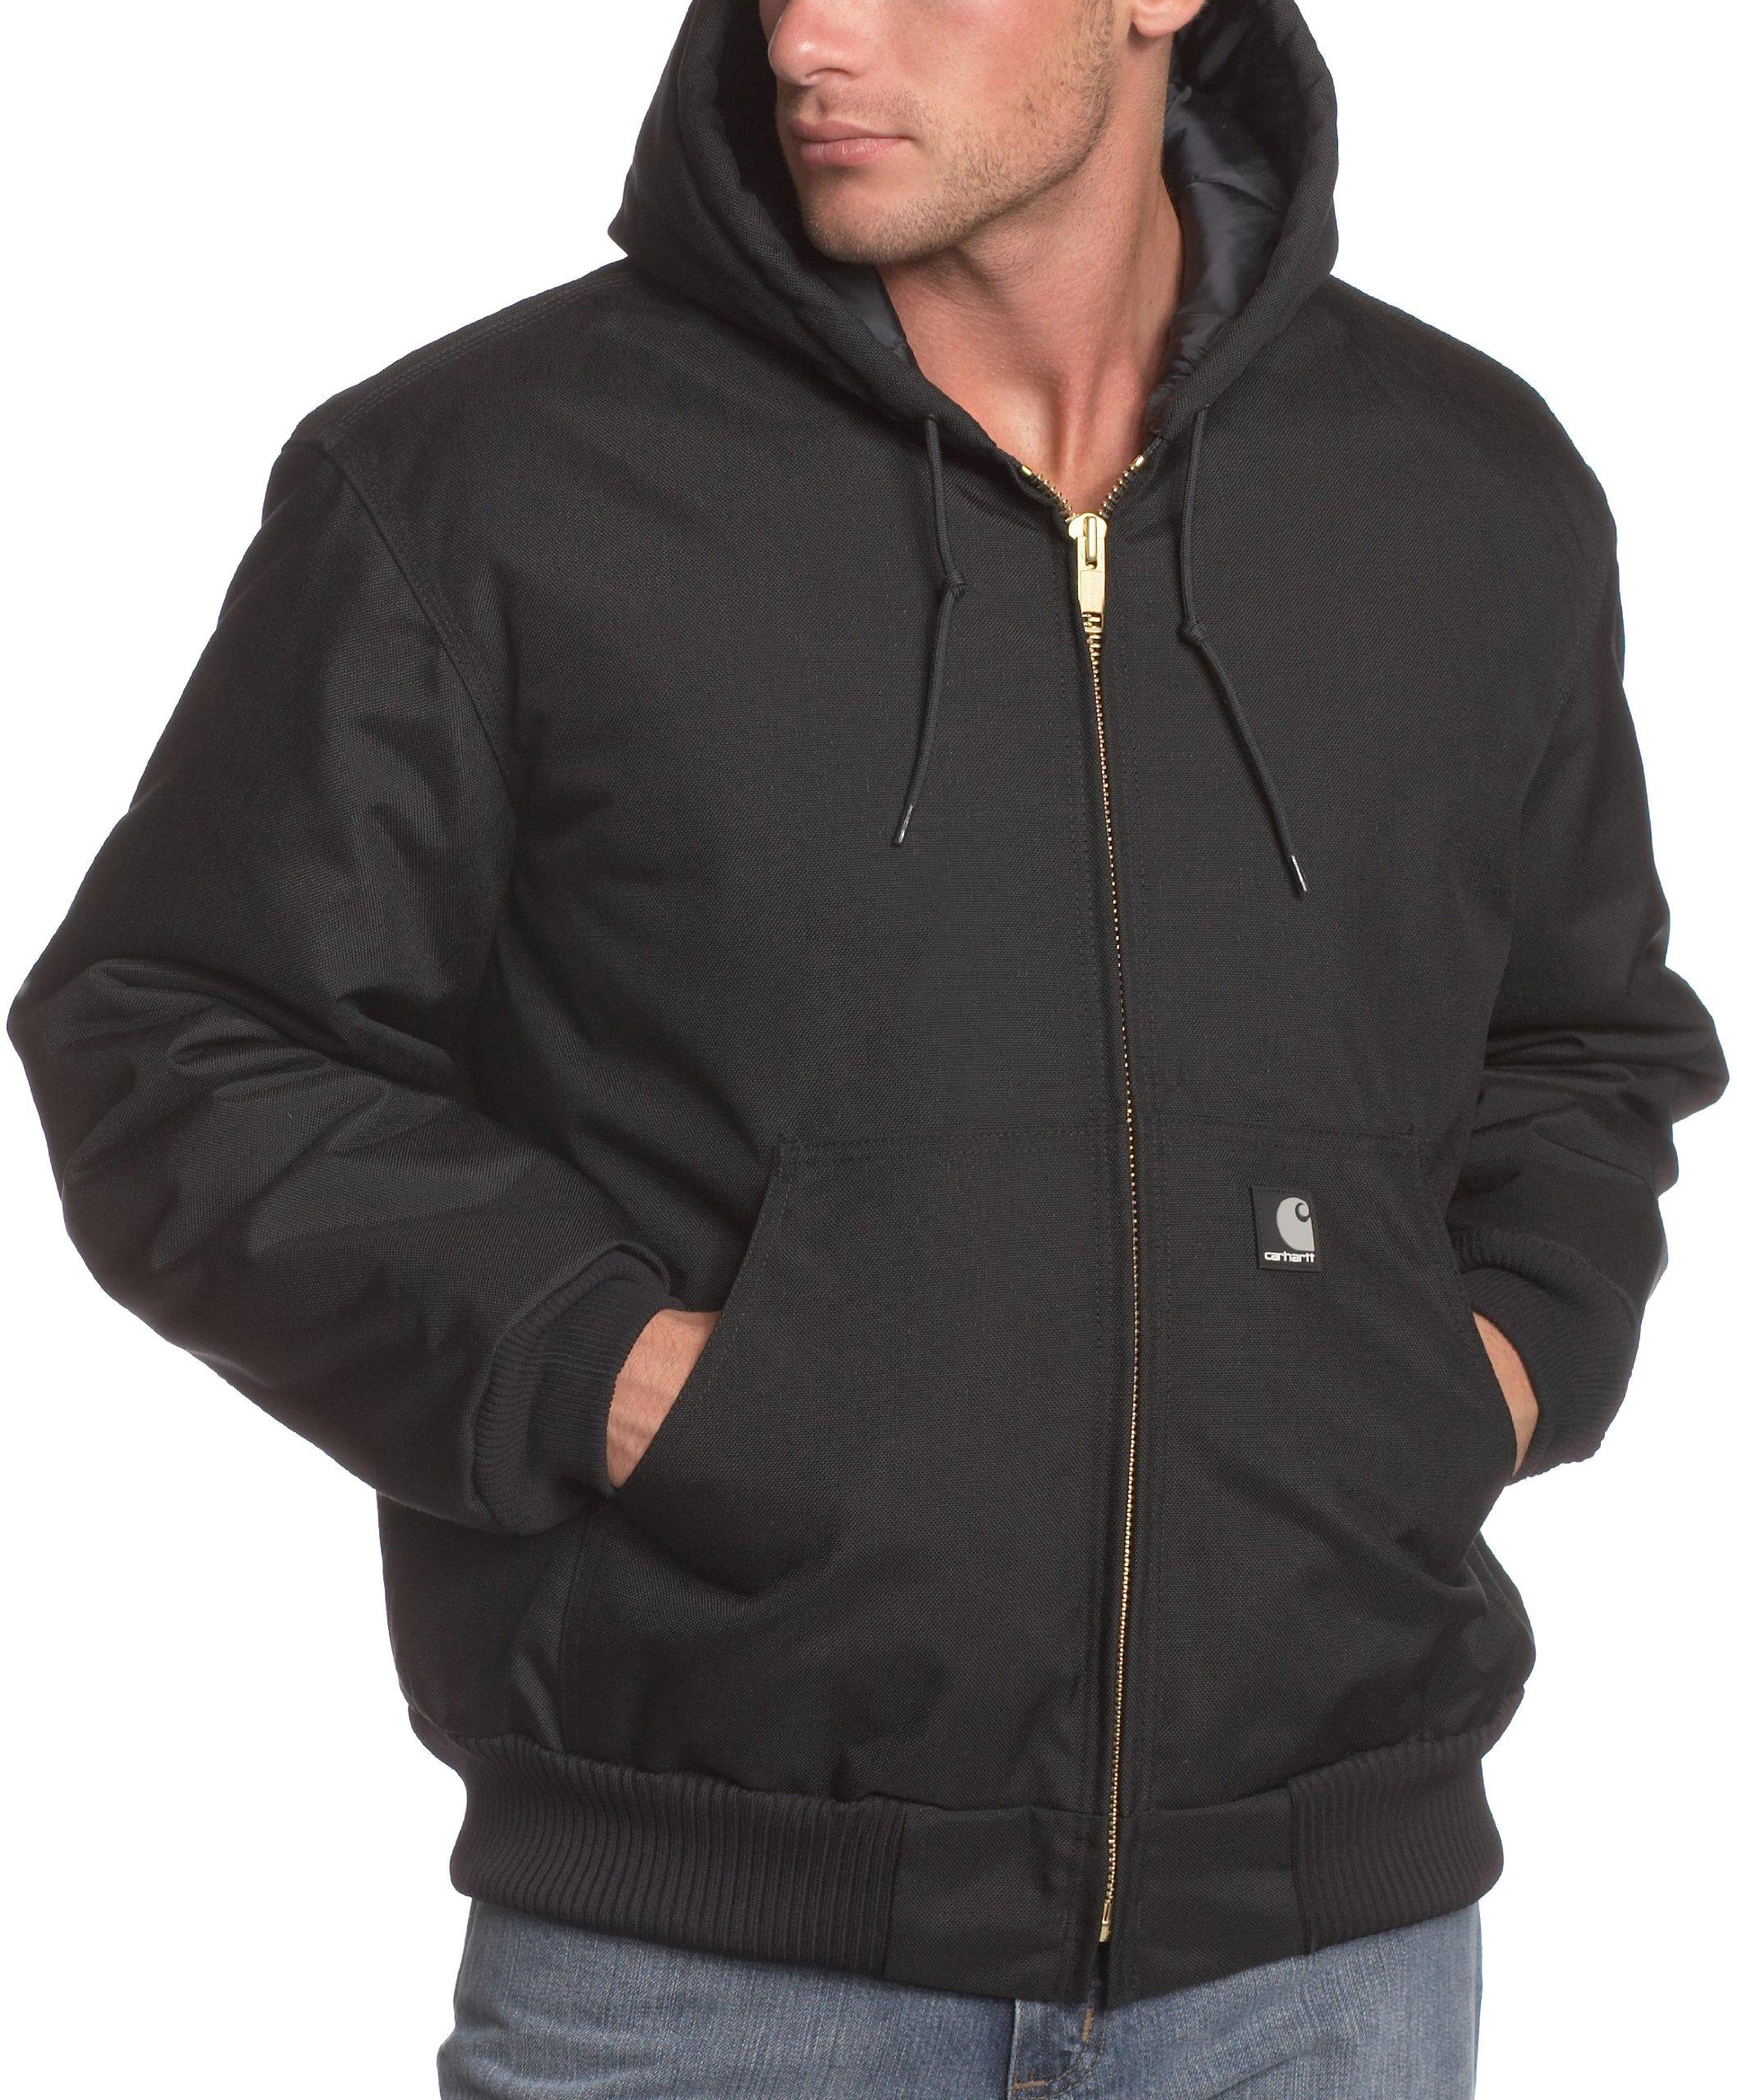 Carhartt Men's Big & Tall Arctic Quilt Lined Yukon Active Jacket,Black,X-Large Tall by Carhartt